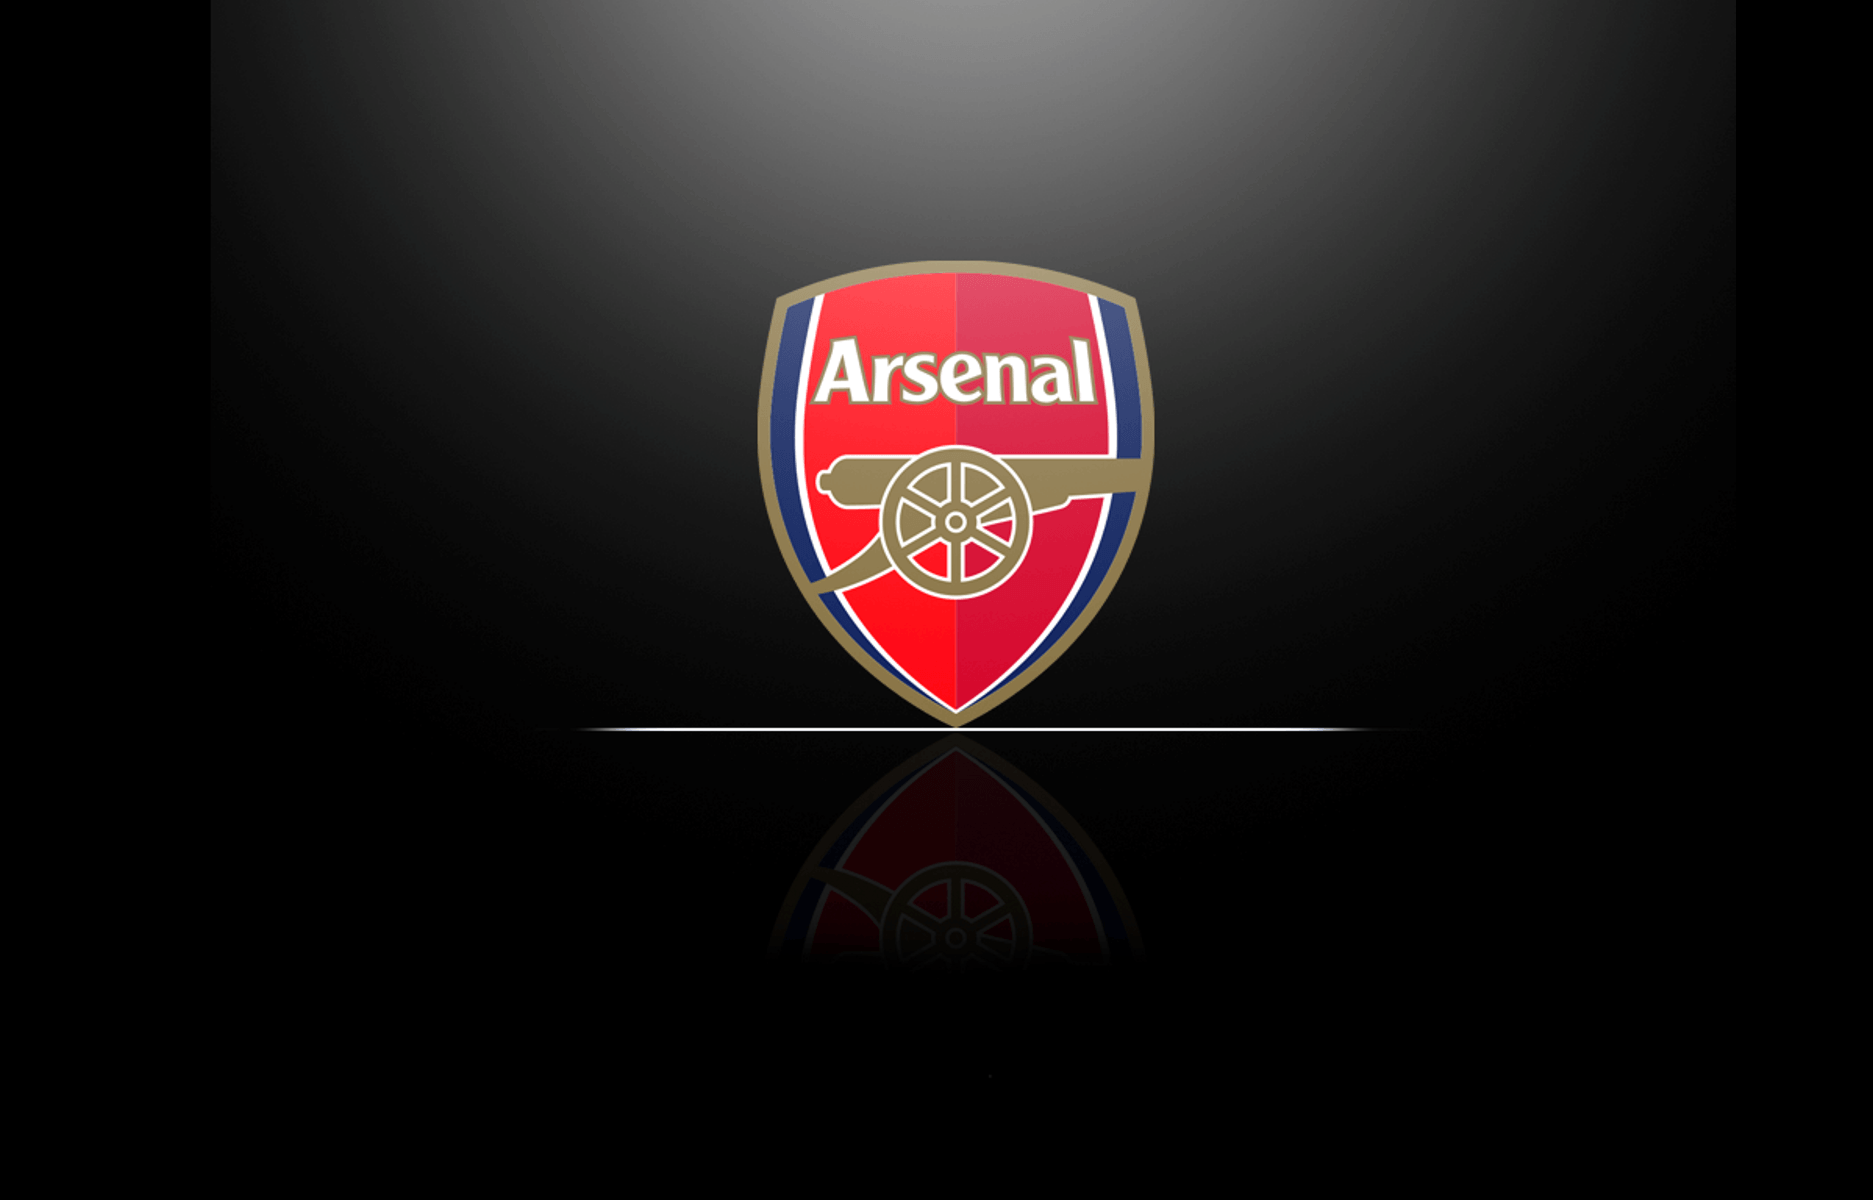 Hình nền Arsenal logo